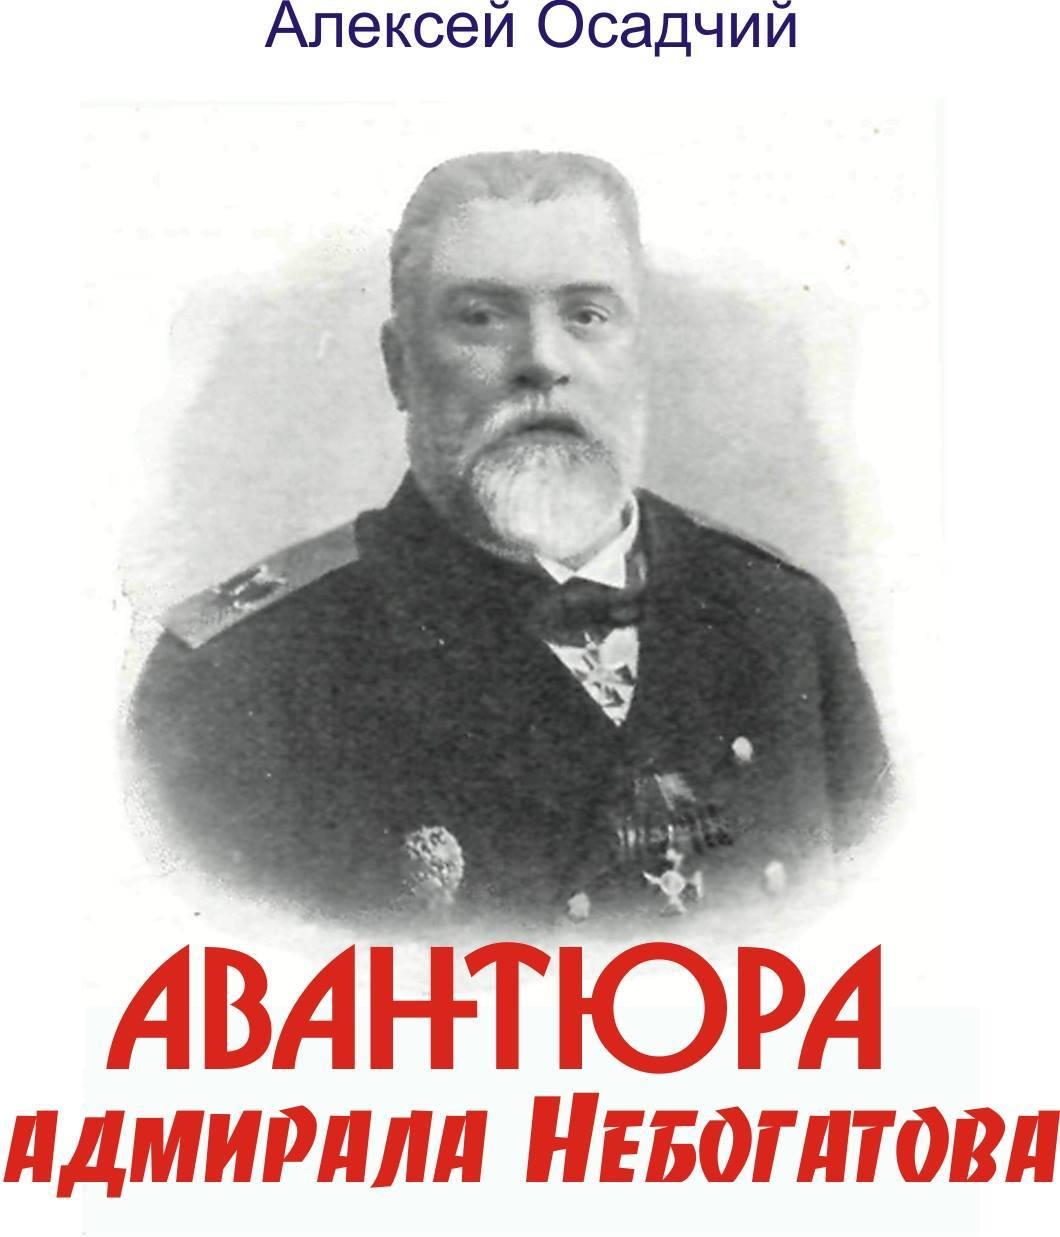 Авантюра адмирала Небогатова